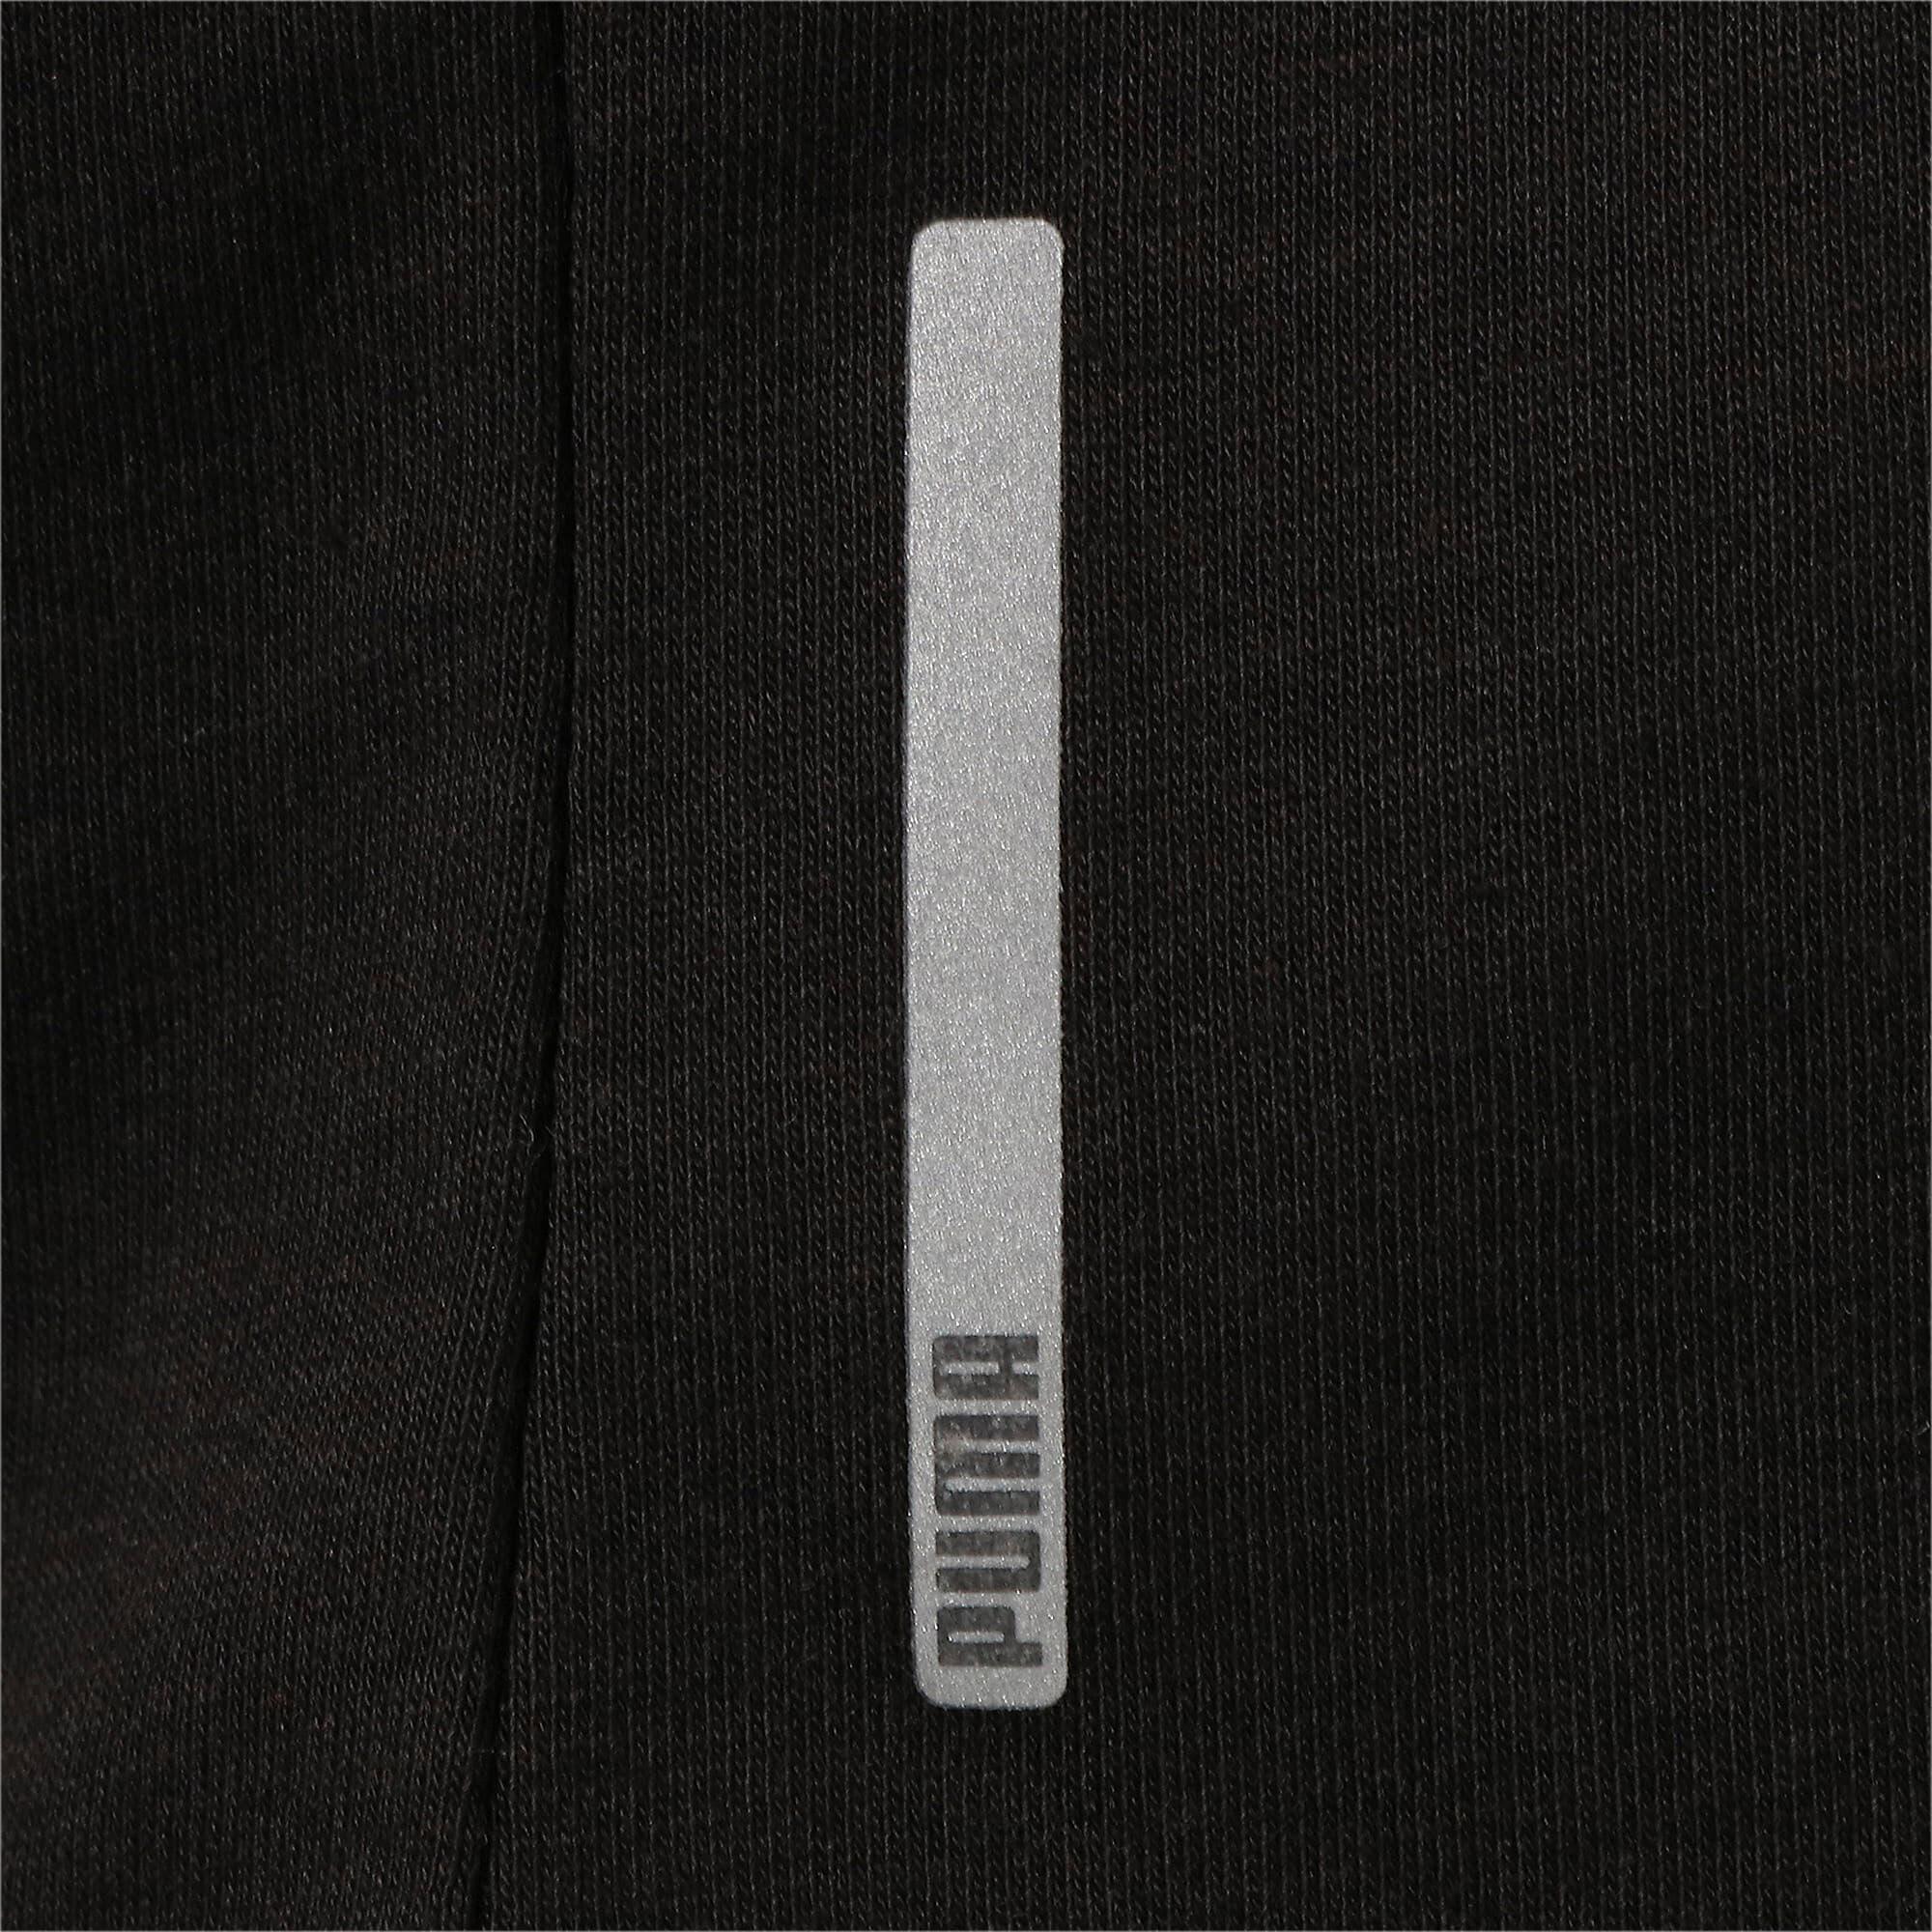 Thumbnail 10 of スタジオ SS ウィメンズ トレーニング メッシュ キャット Tシャツ 半袖, Puma Black-Yellow Alert, medium-JPN